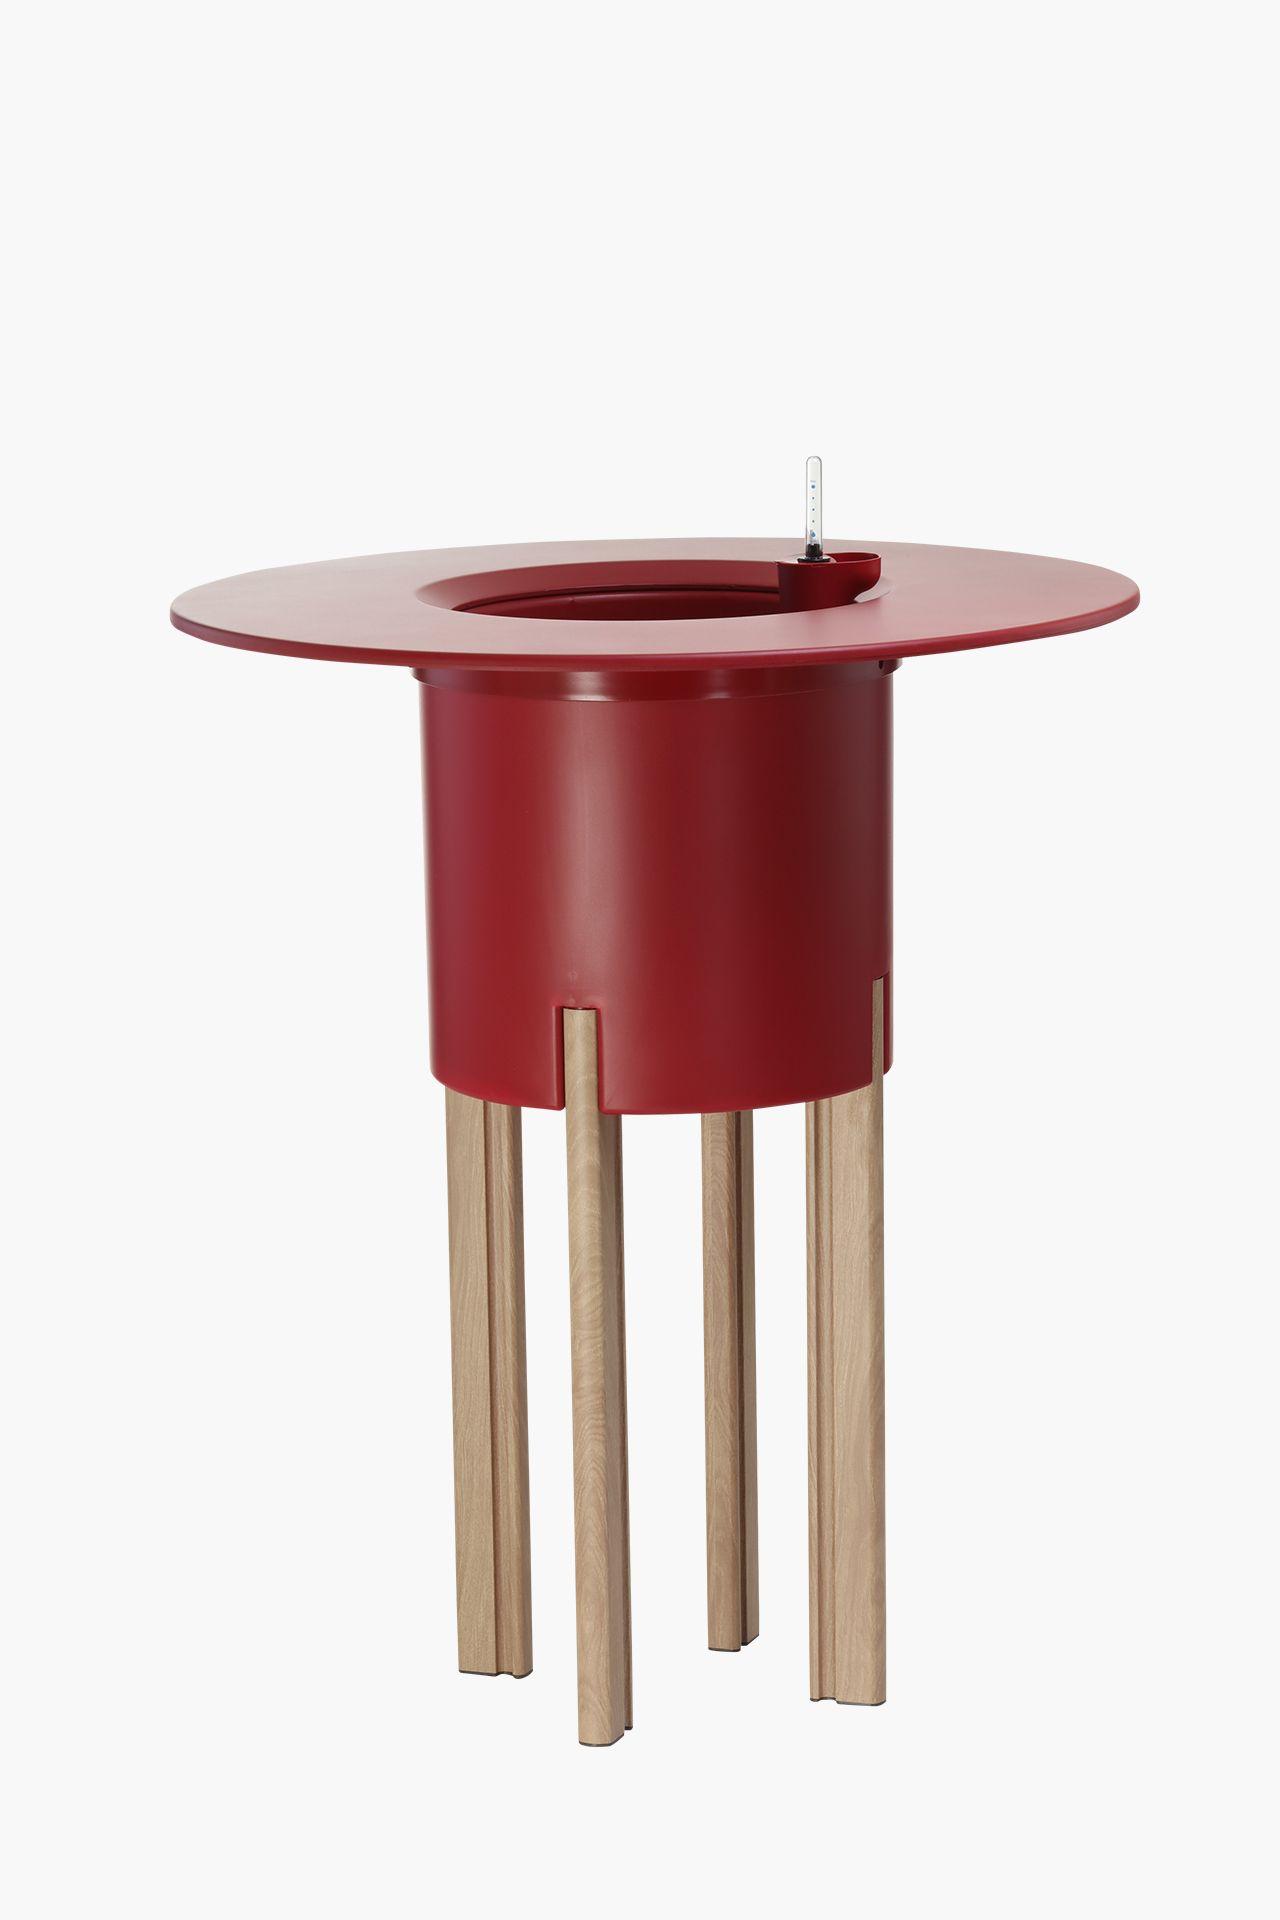 pflanzk bel tischplatte kunststoff rund mondum tondo 80 cm rot ebay. Black Bedroom Furniture Sets. Home Design Ideas